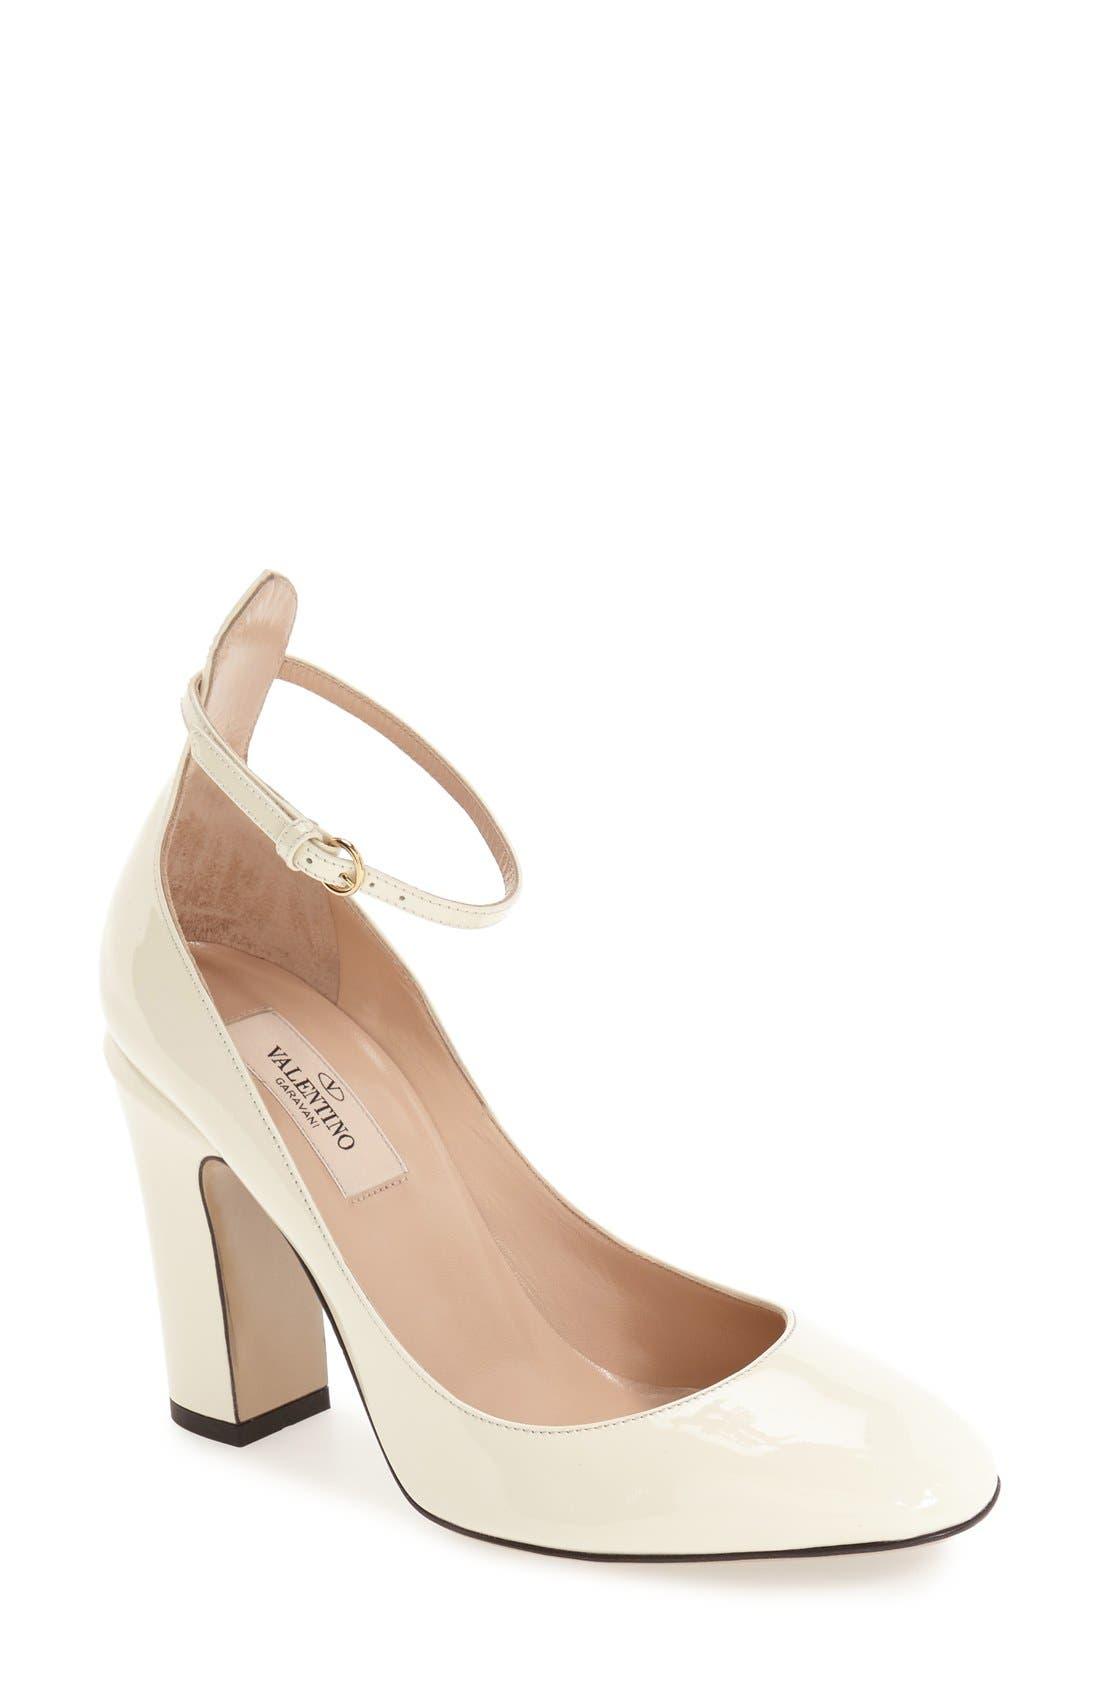 Main Image - Valentino 'Tango' Ankle Strap Pump (Women)